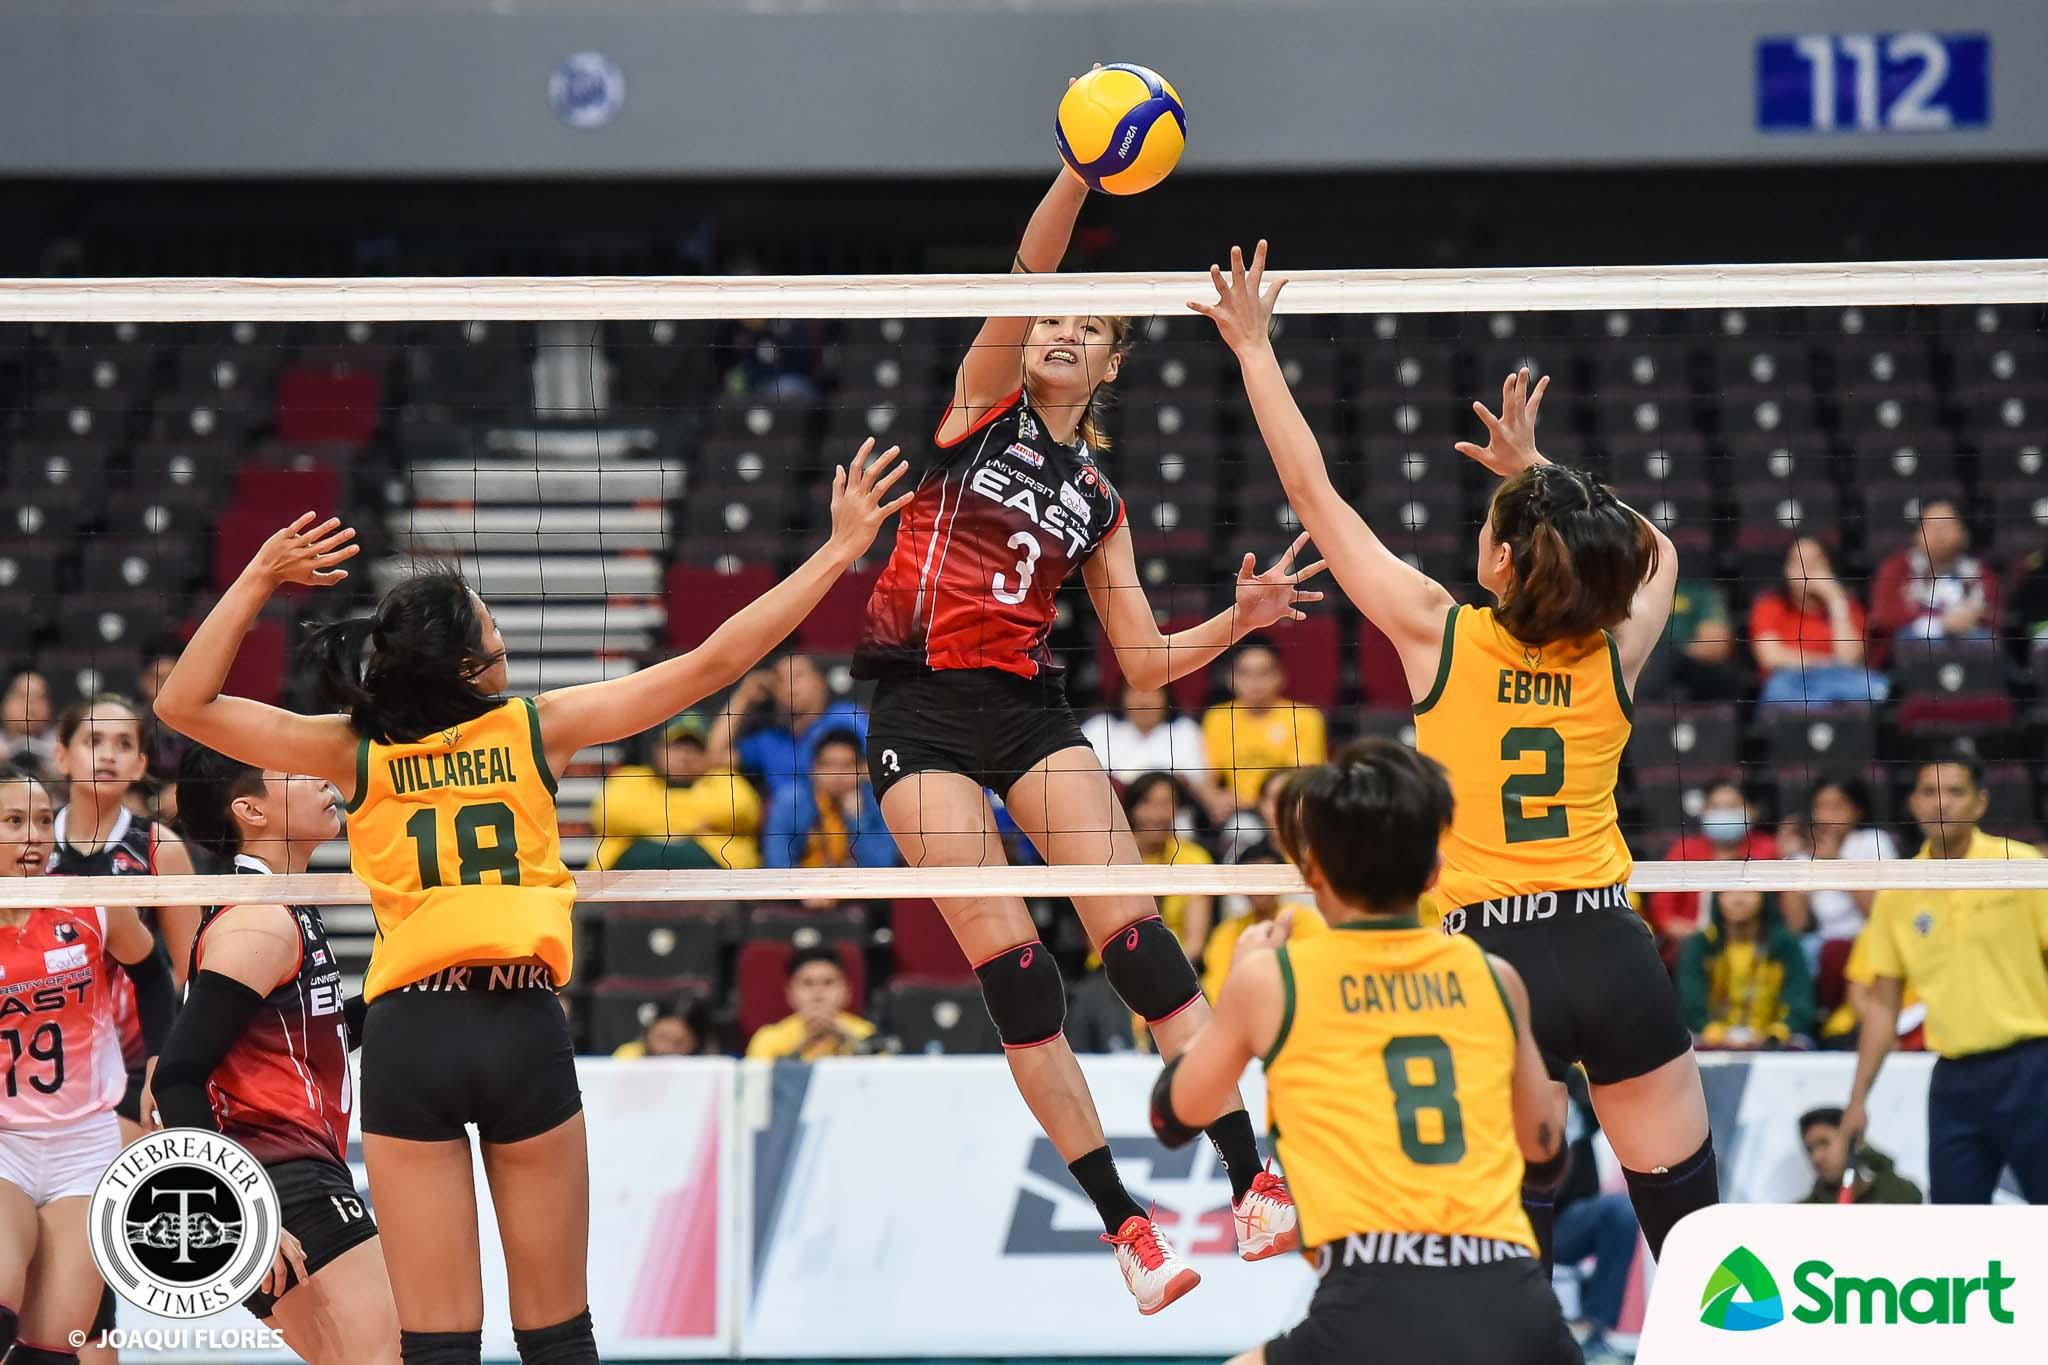 UAAP-82-Volleyball-FEU-vs.-UE-Gabarda-7423 PLDT picks up Generika's Soyud, Basas, Gabarda, San Beda's Viray NCAA News PVL SBC UAAP UE Volleyball  - philippine sports news